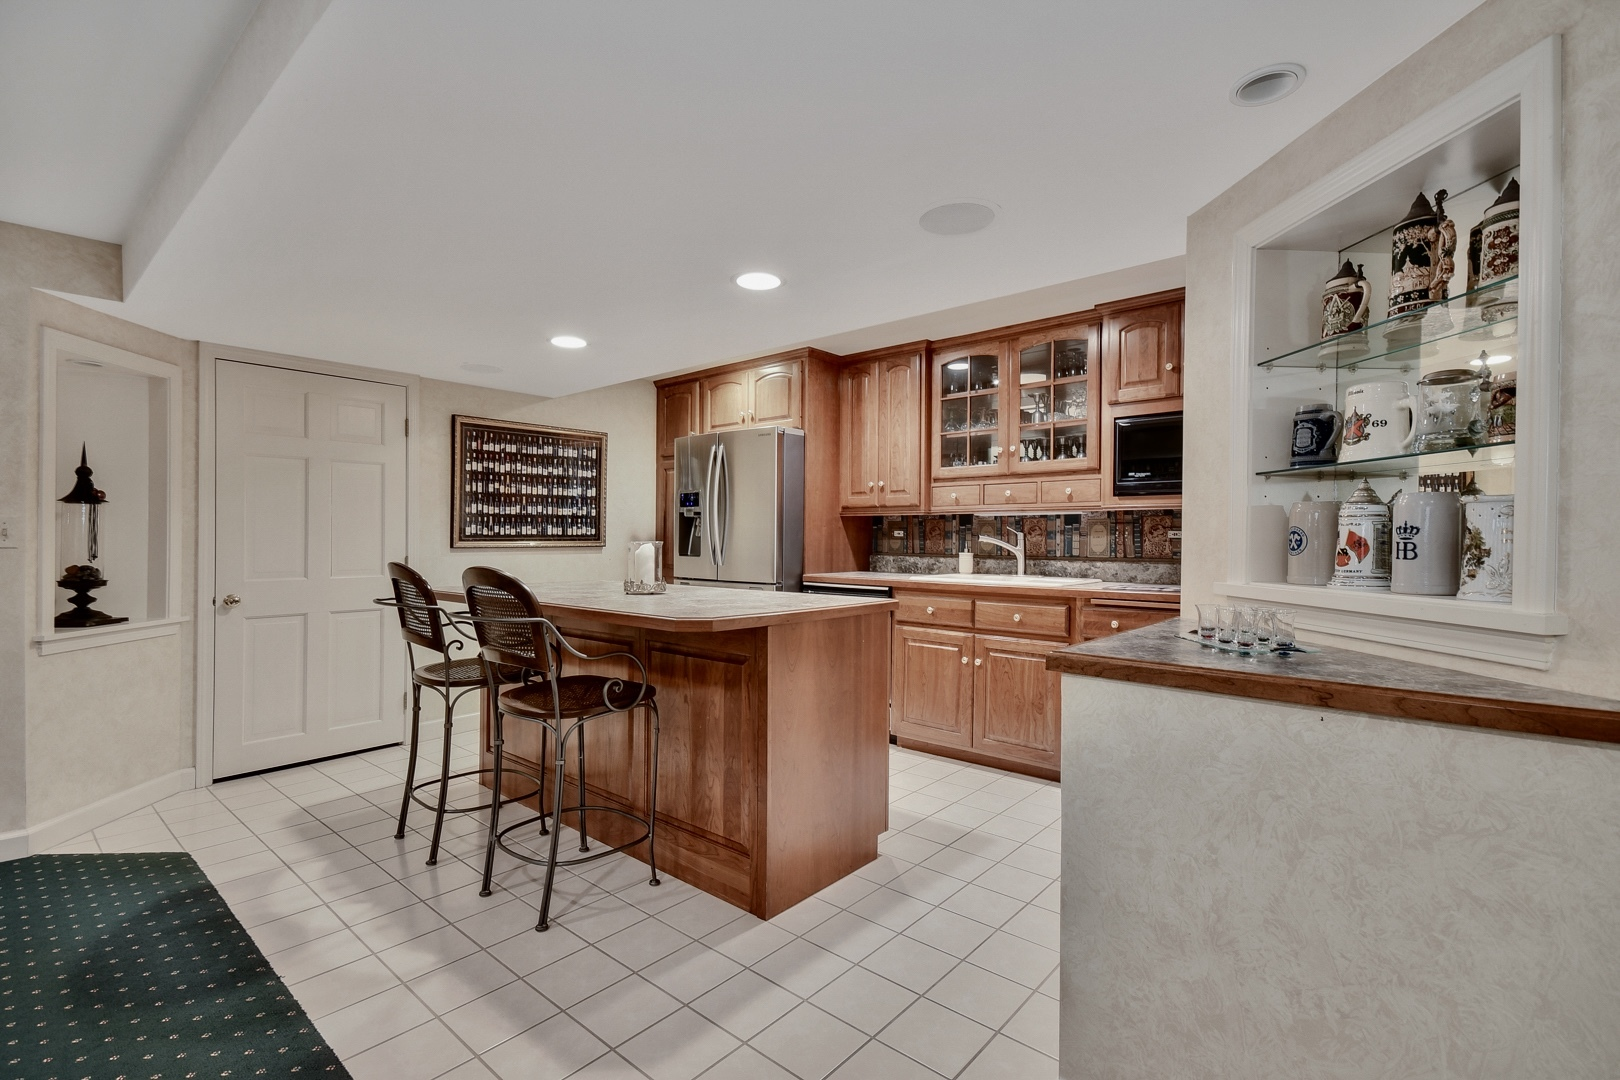 825 PERSIMMON, ST. CHARLES, Illinois, 60174